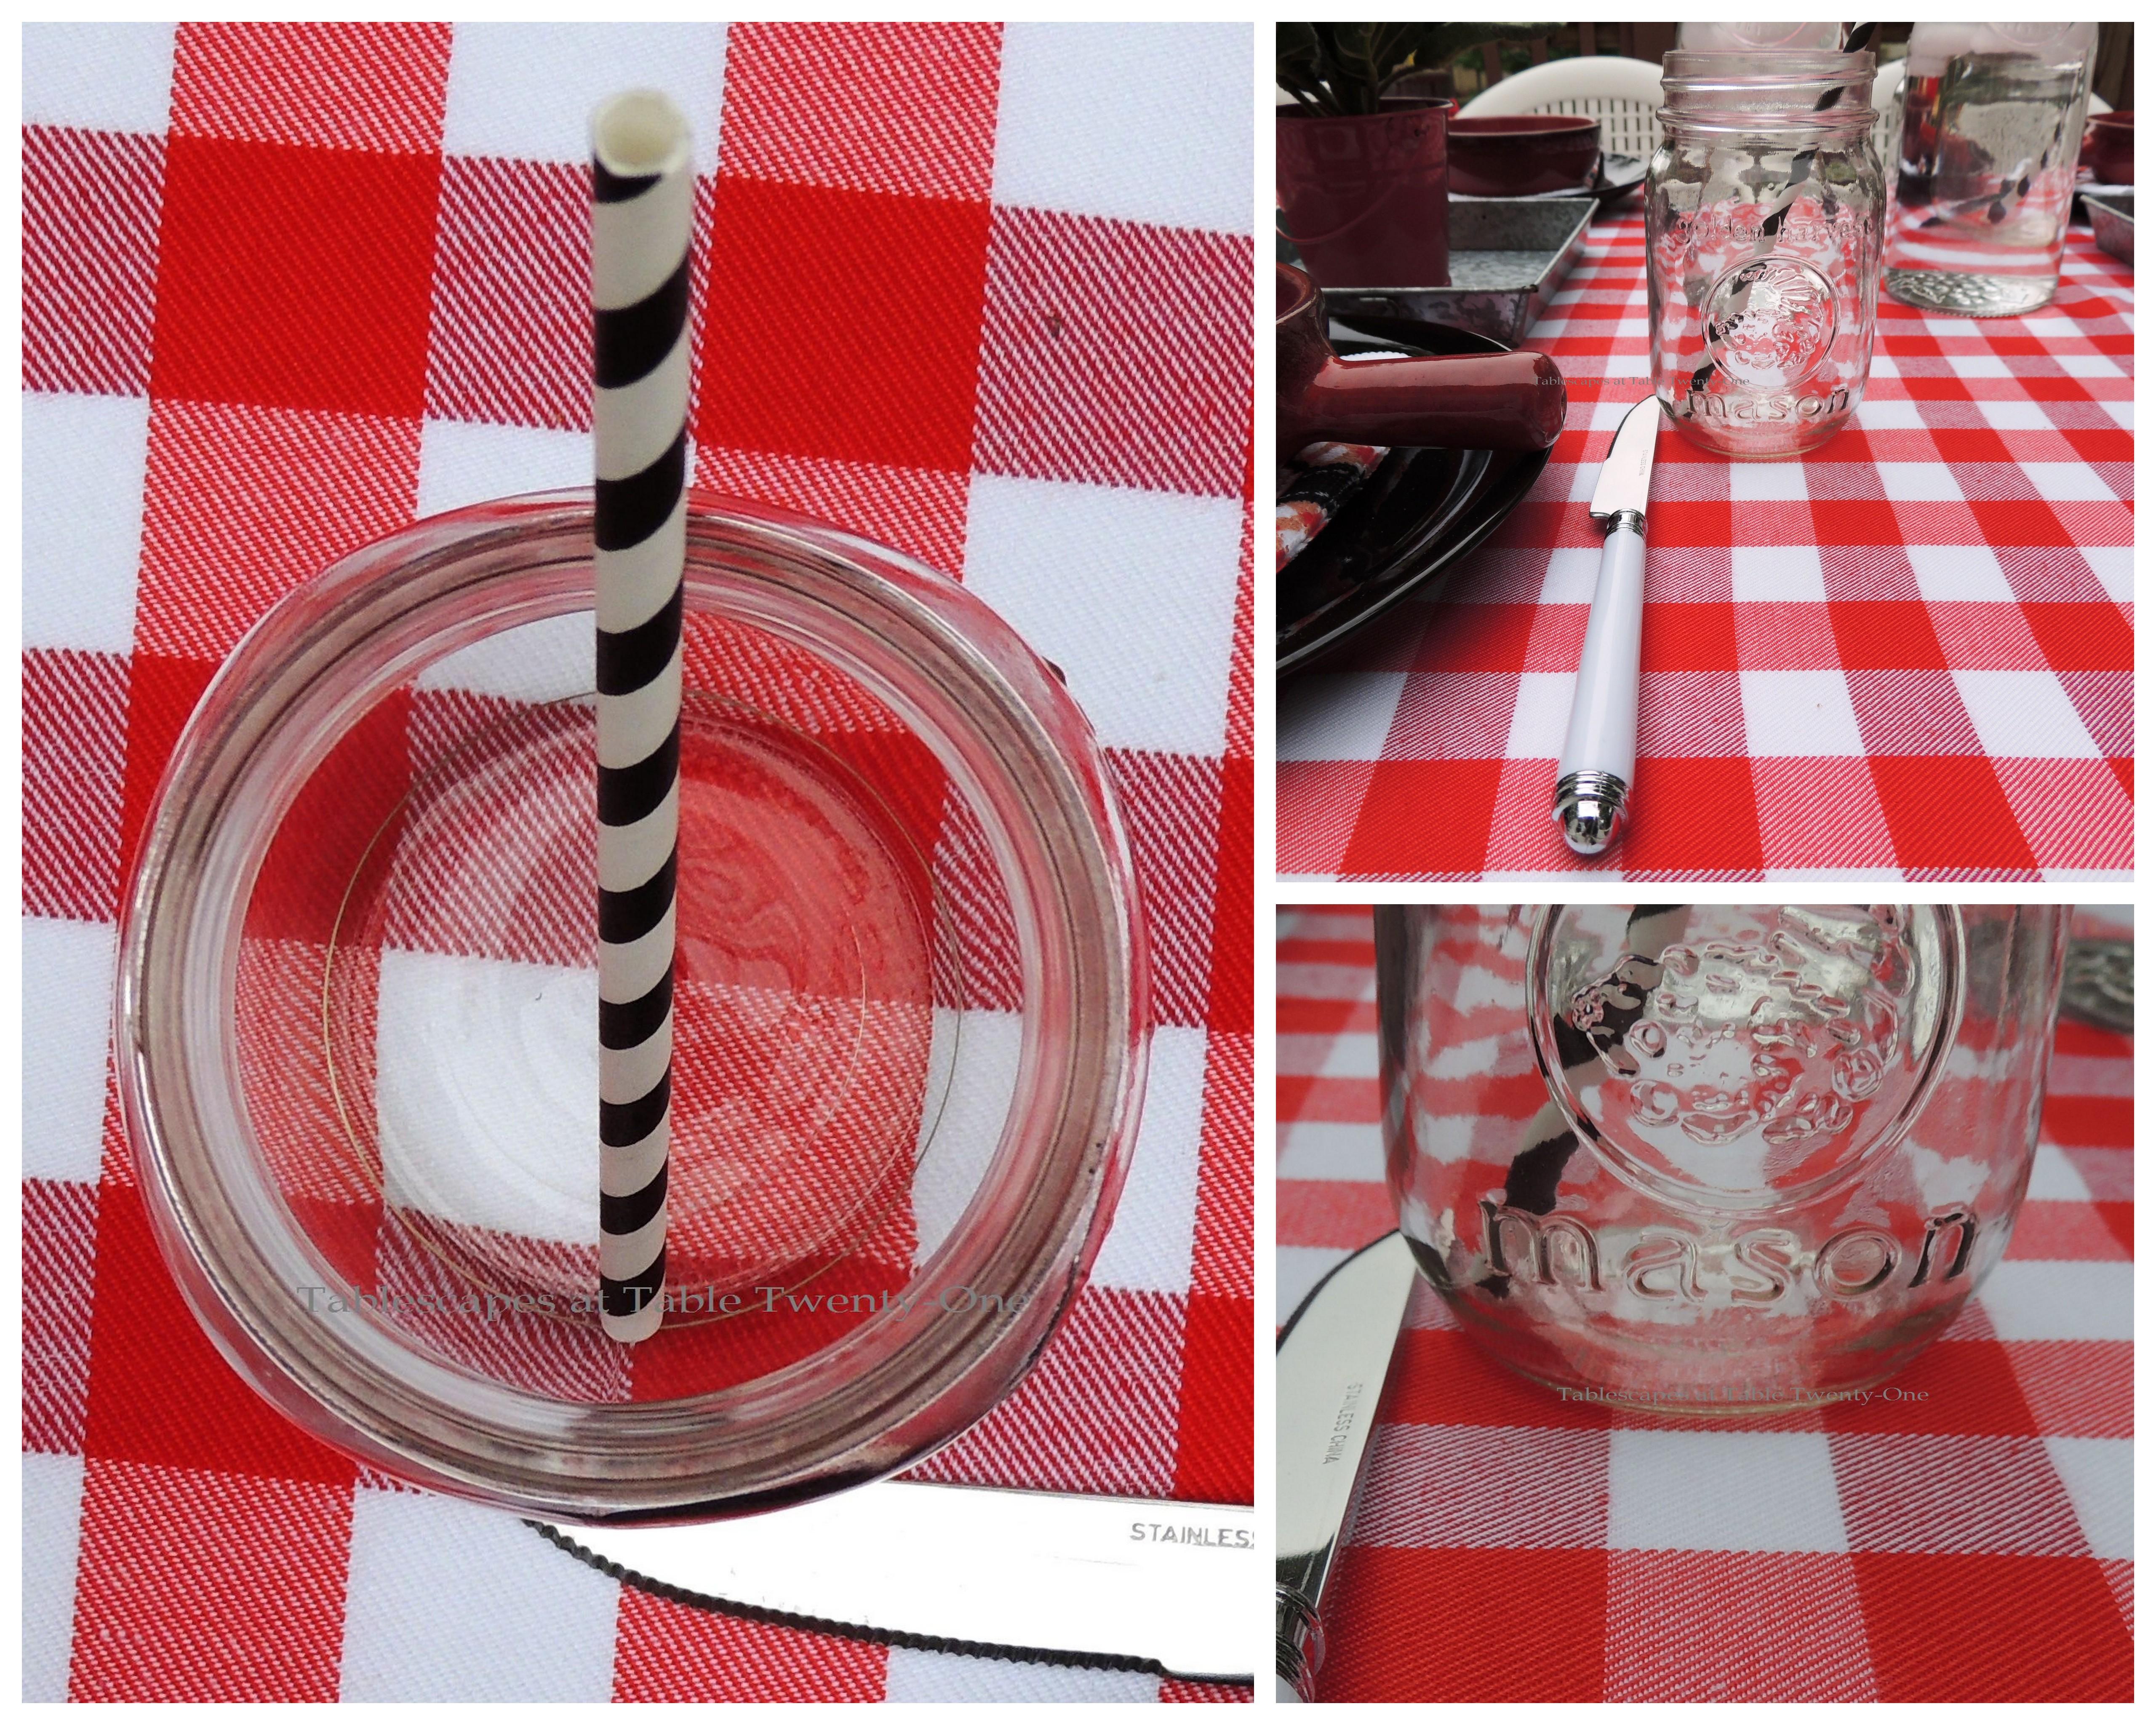 Tablescapes at Table Twenty-One, www.tabletwentyone.wordpress.com: Grill It Up! - Mason jar collage